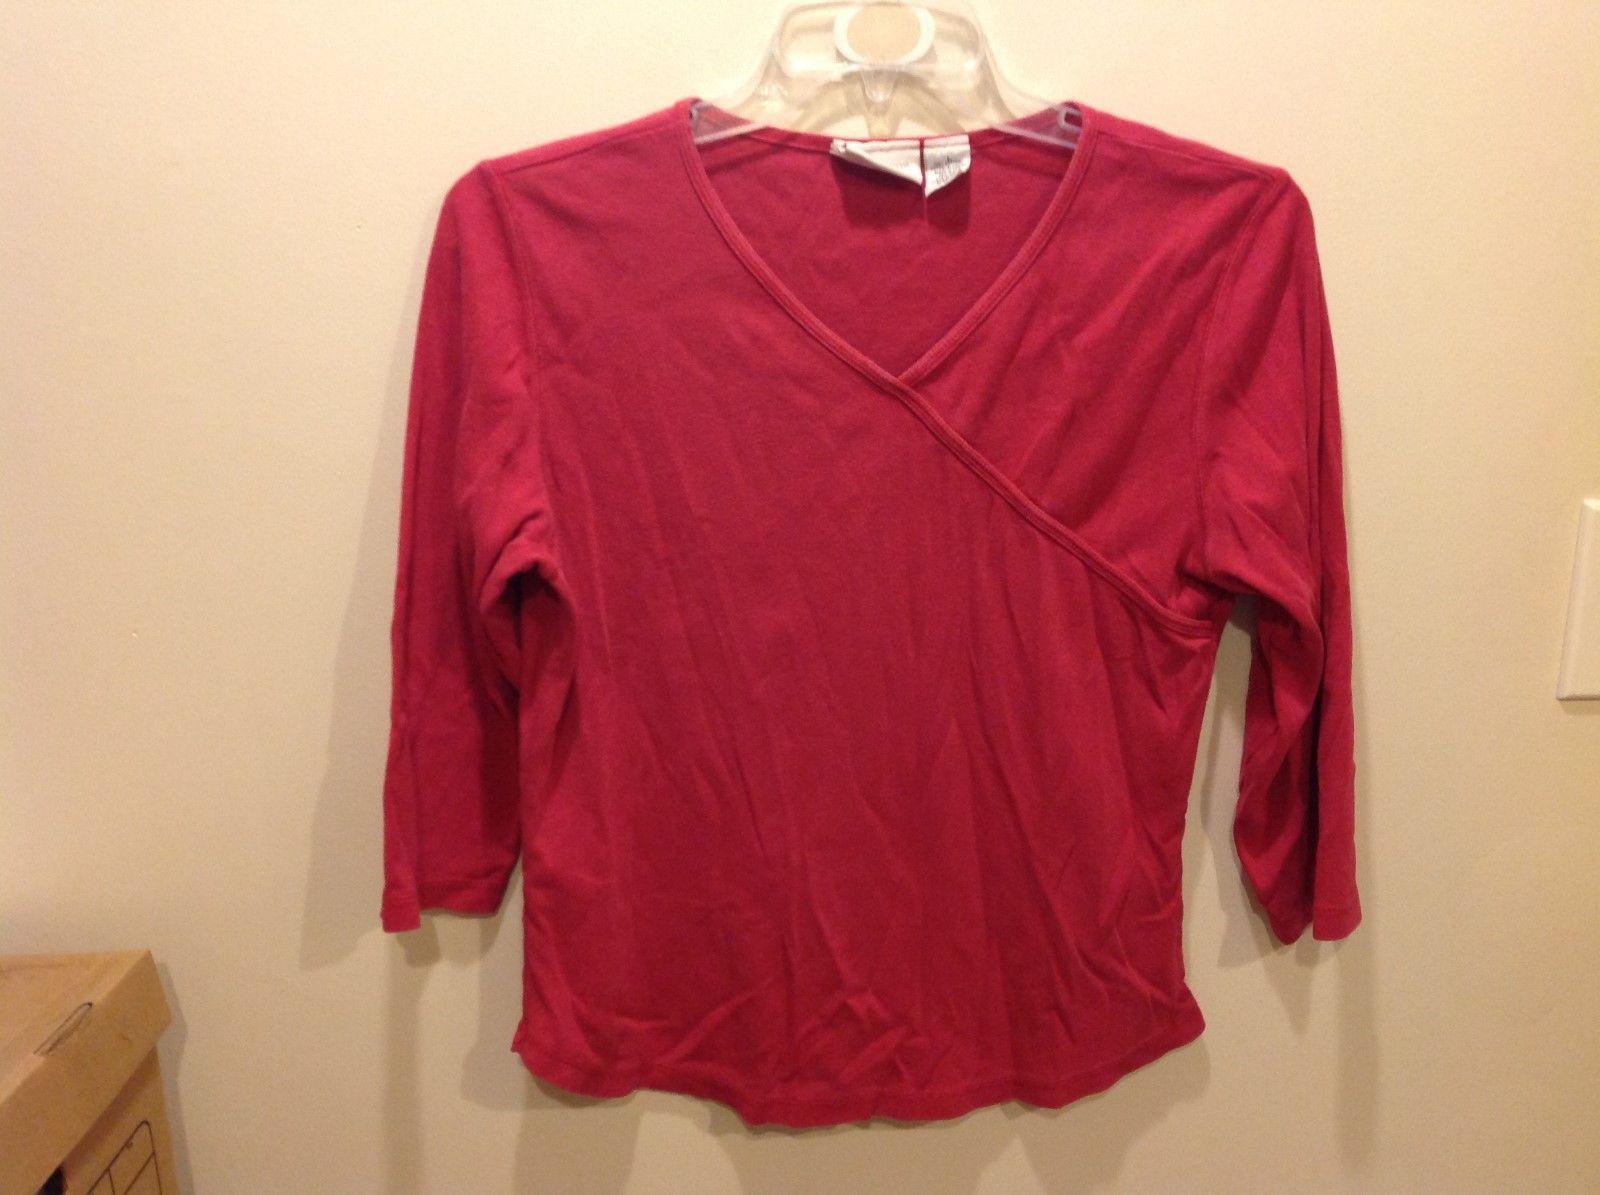 Liz Claiborne Magenta Colored 3/4 Sleeve Top Sz LG